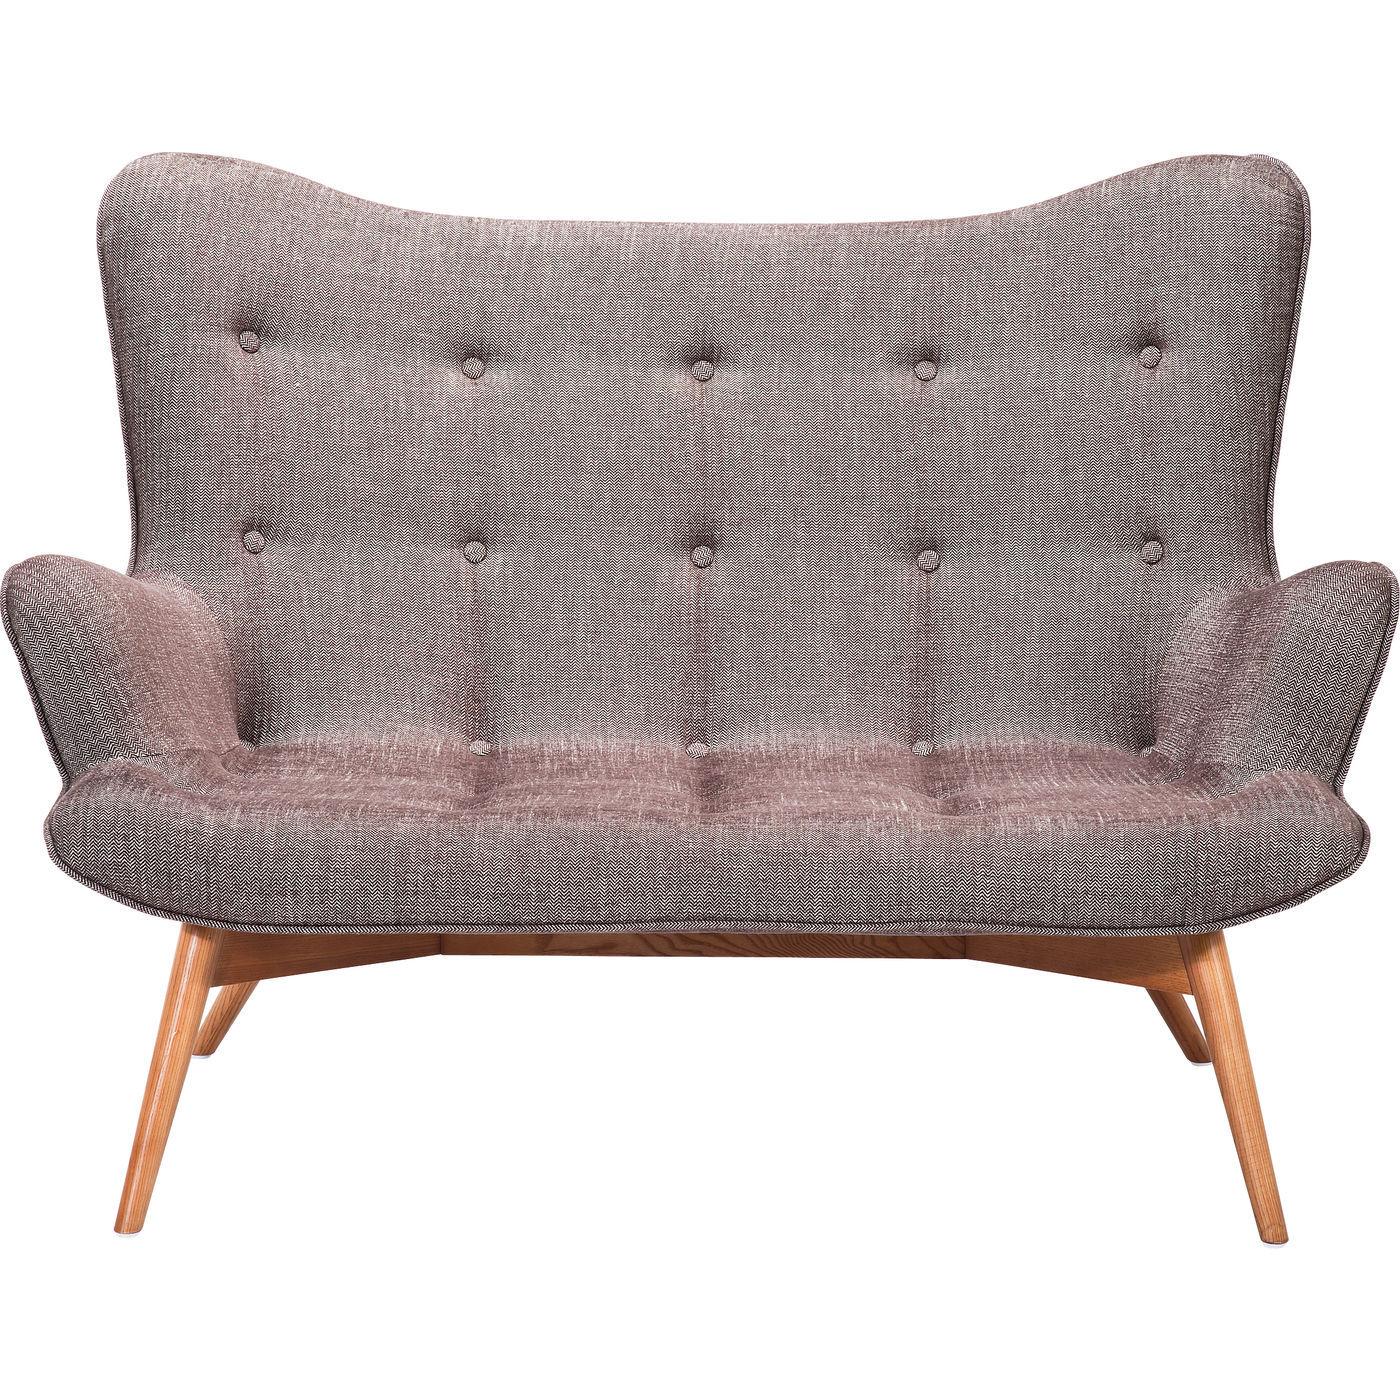 Kare design sofa, angels wings fra kare design fra boboonline.dk